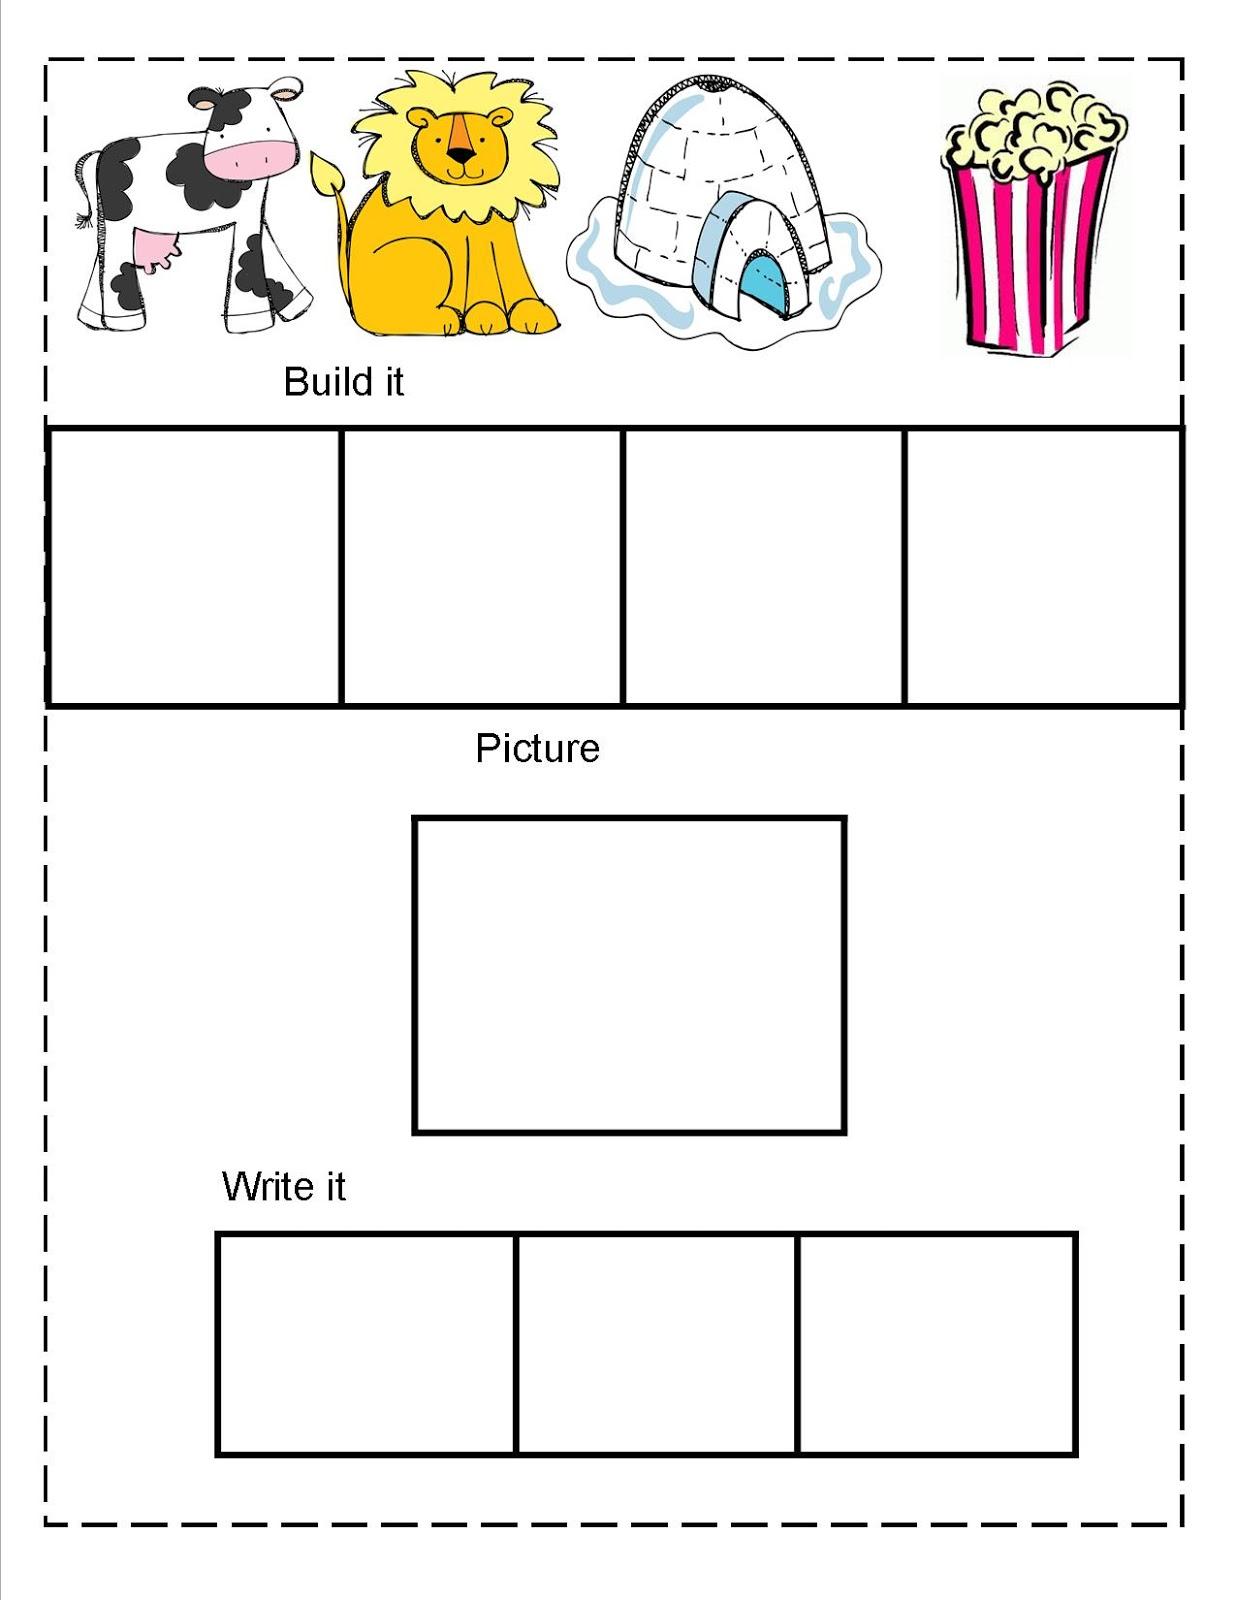 Phonological Awareness Worksheets For Preschool